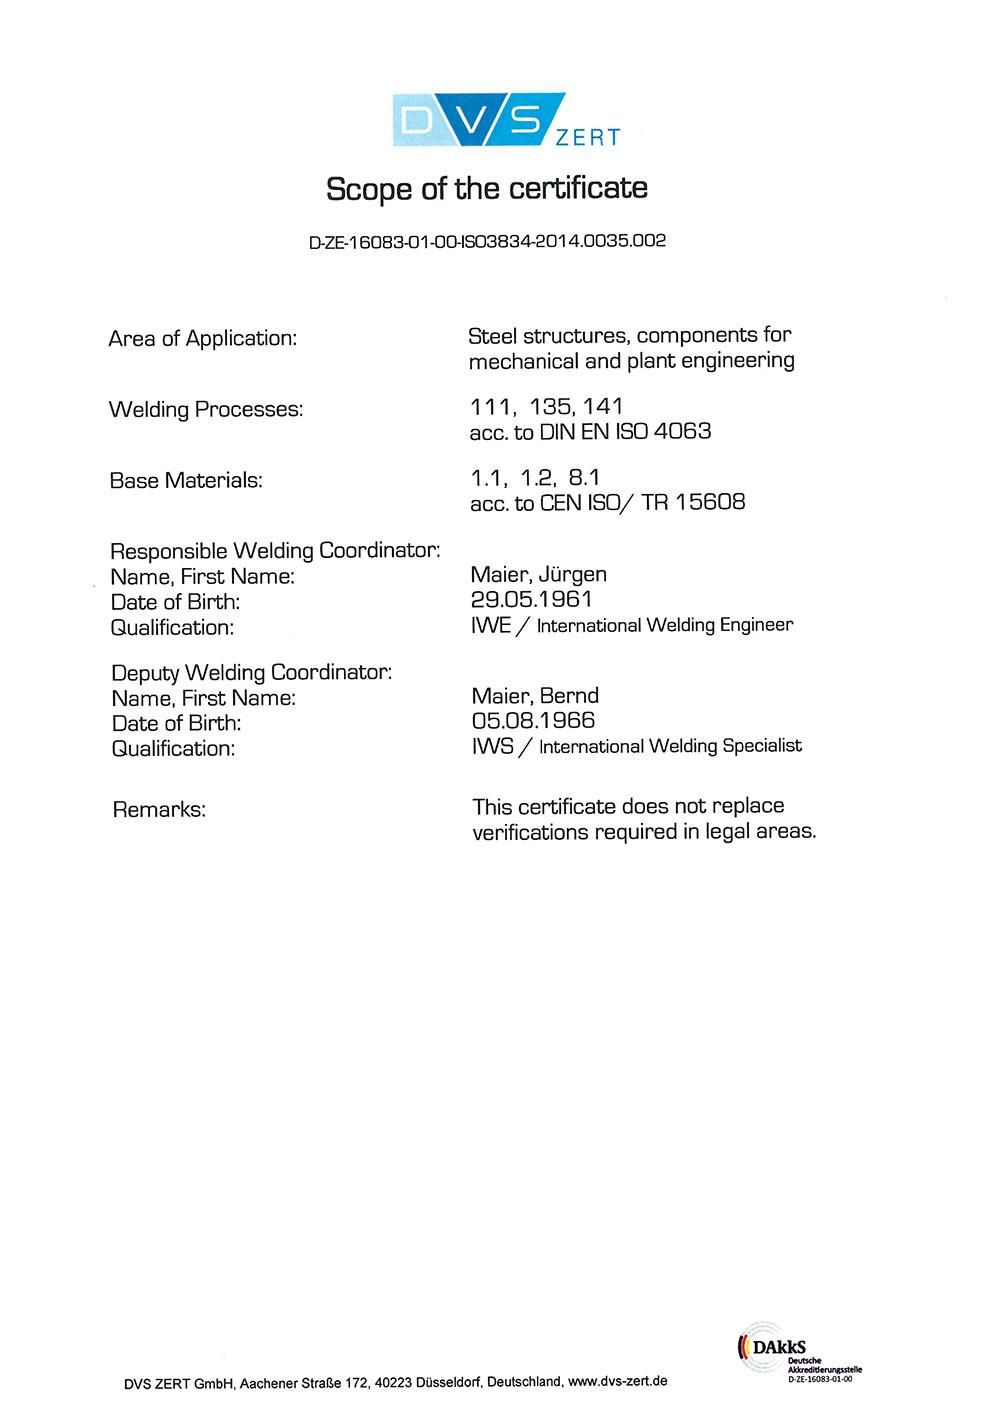 Zertifikat_3834__A_Maier_GmbH_bis_11_2019-1_Seite4